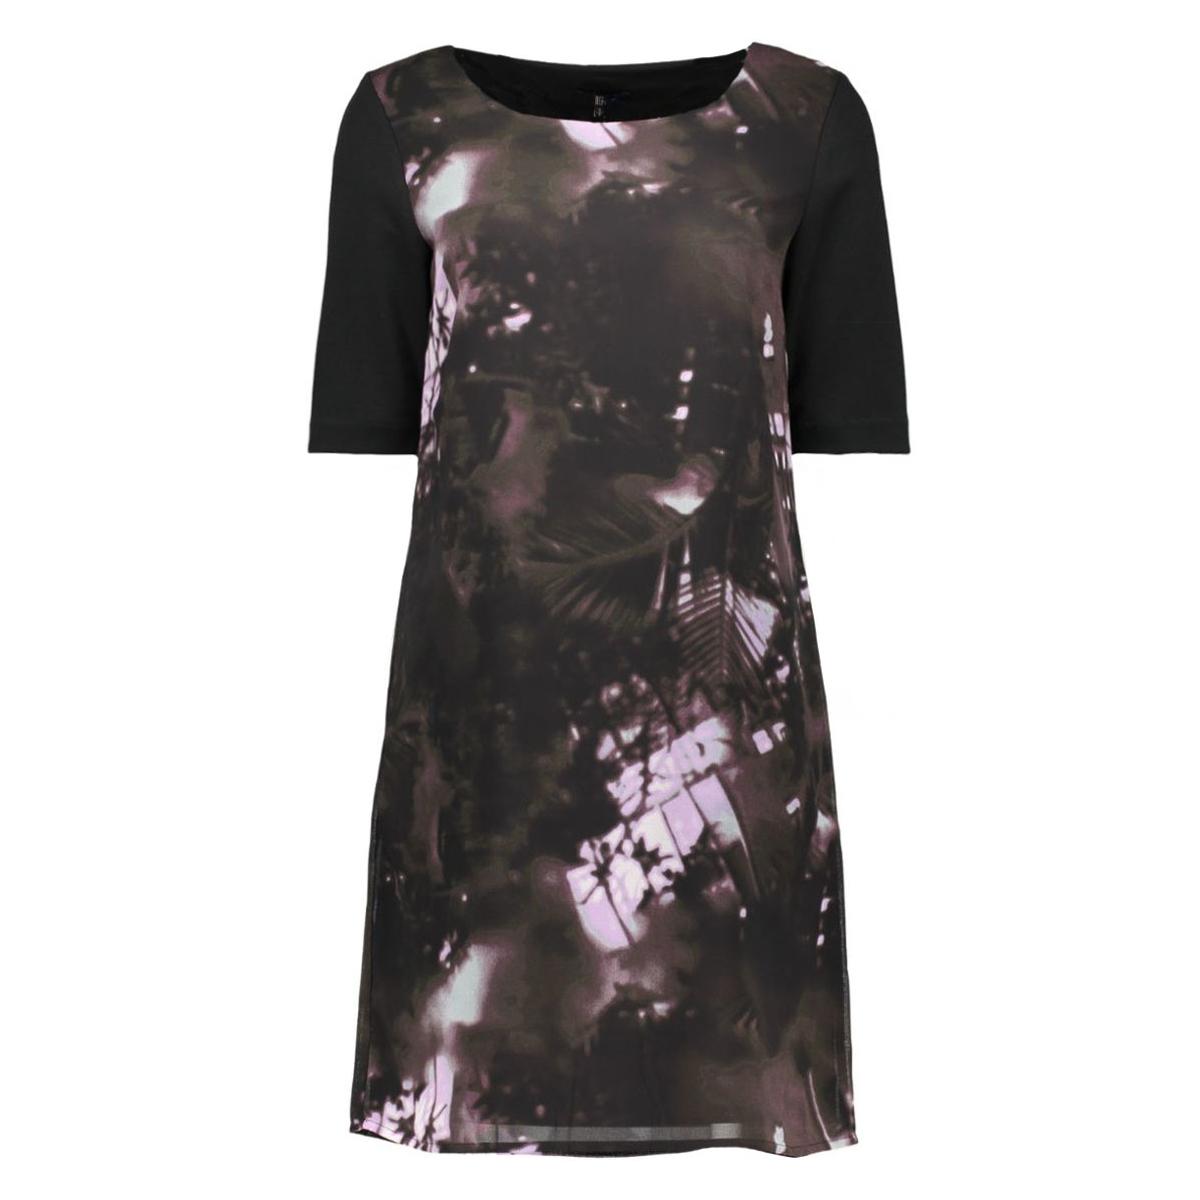 33001054 dept jurk 75014 royal purple